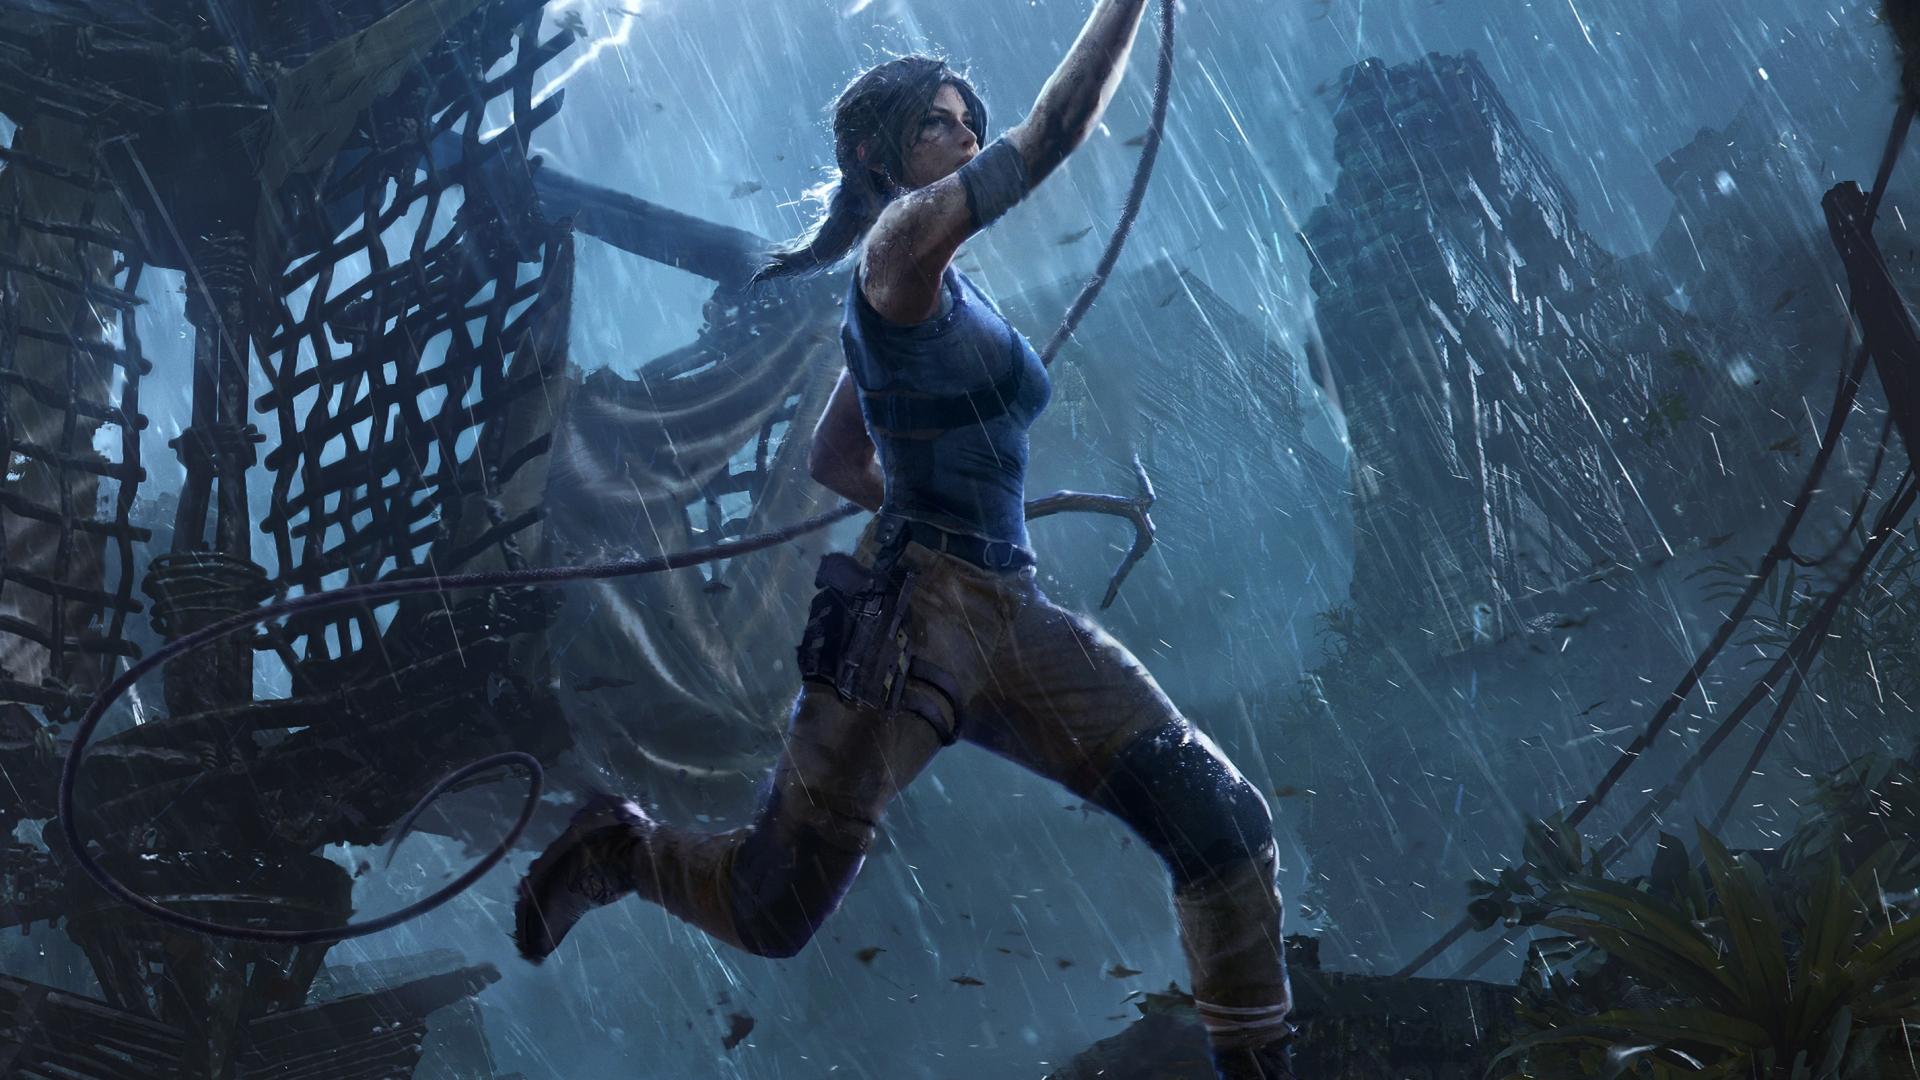 Rise Of The Tomb Raider Lara Croft UHD 4K Wallpaper   Pixelz